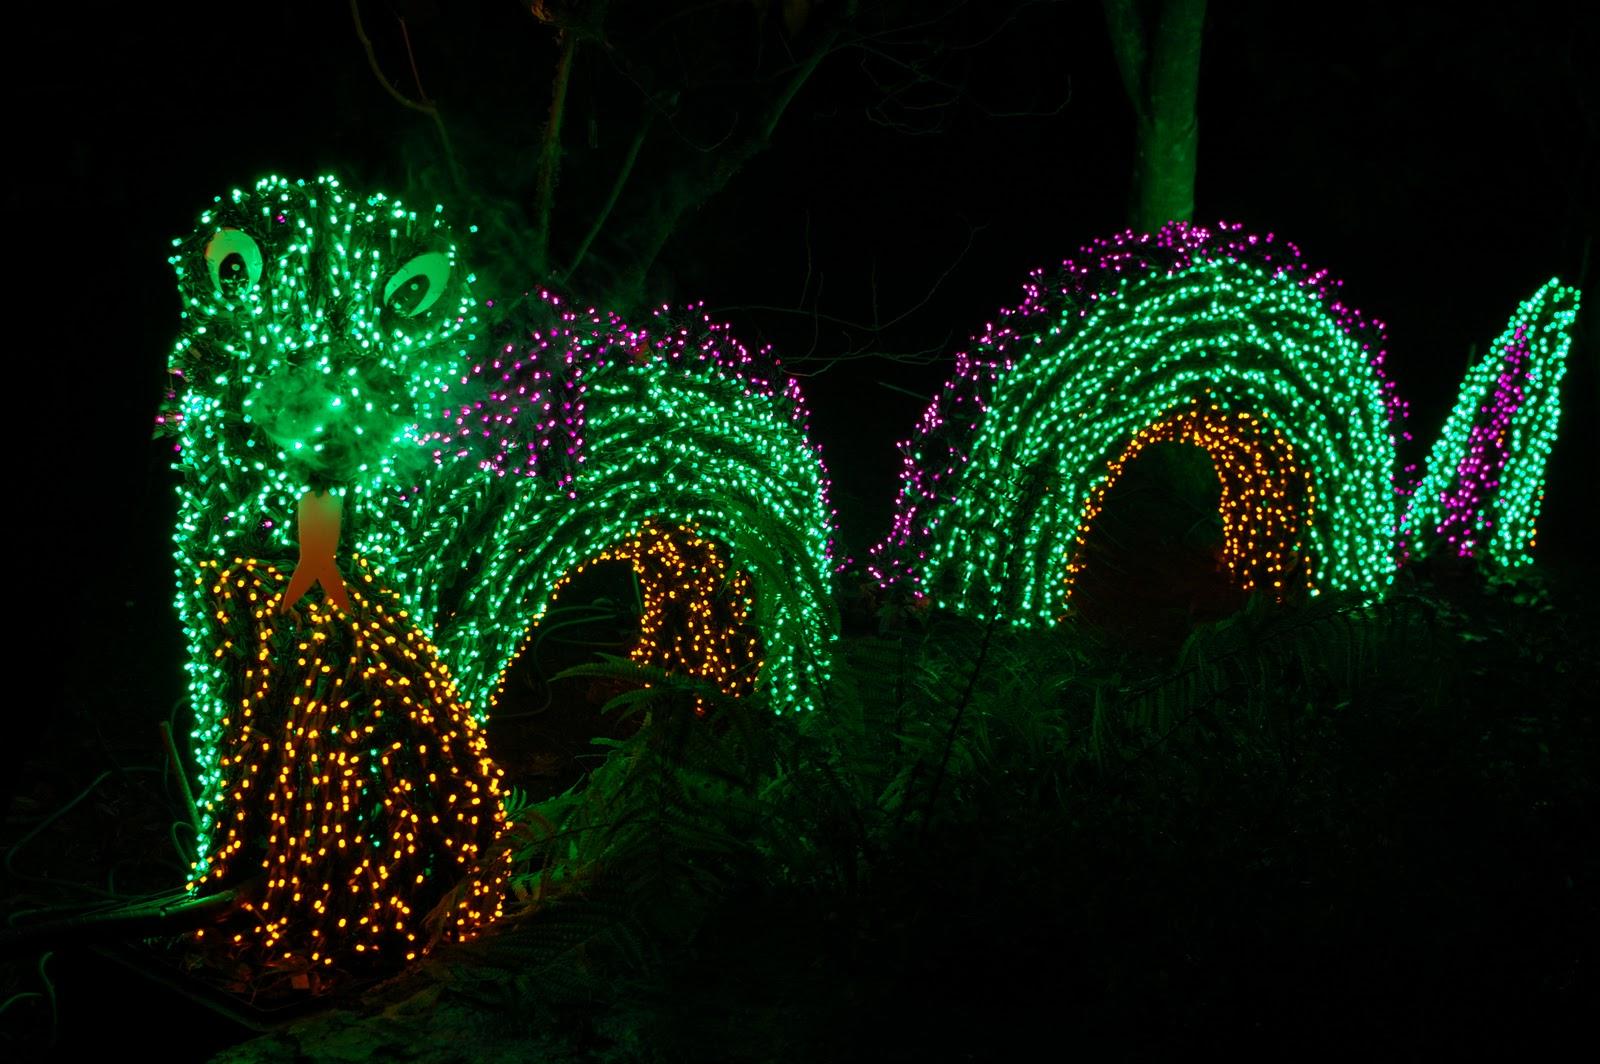 Bellevue botanical gardens christmas lights for Bellevue botanical garden lights